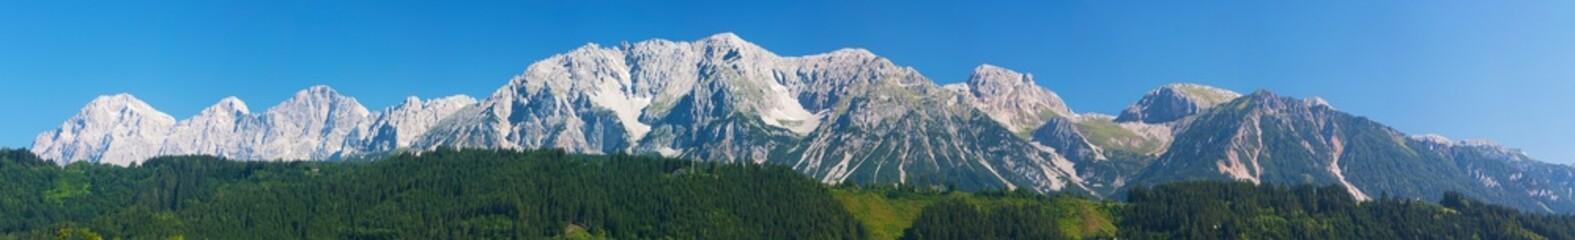 Dachsteinpanorama